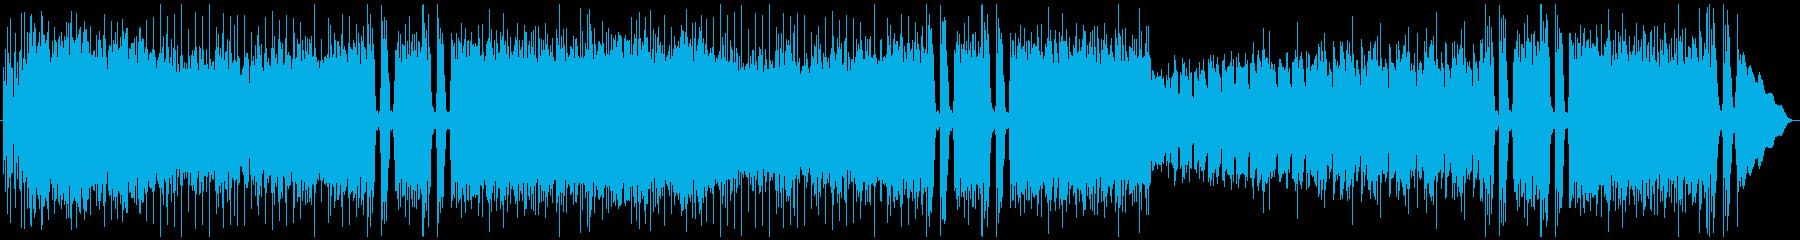 Sum41またはGreendayの...の再生済みの波形